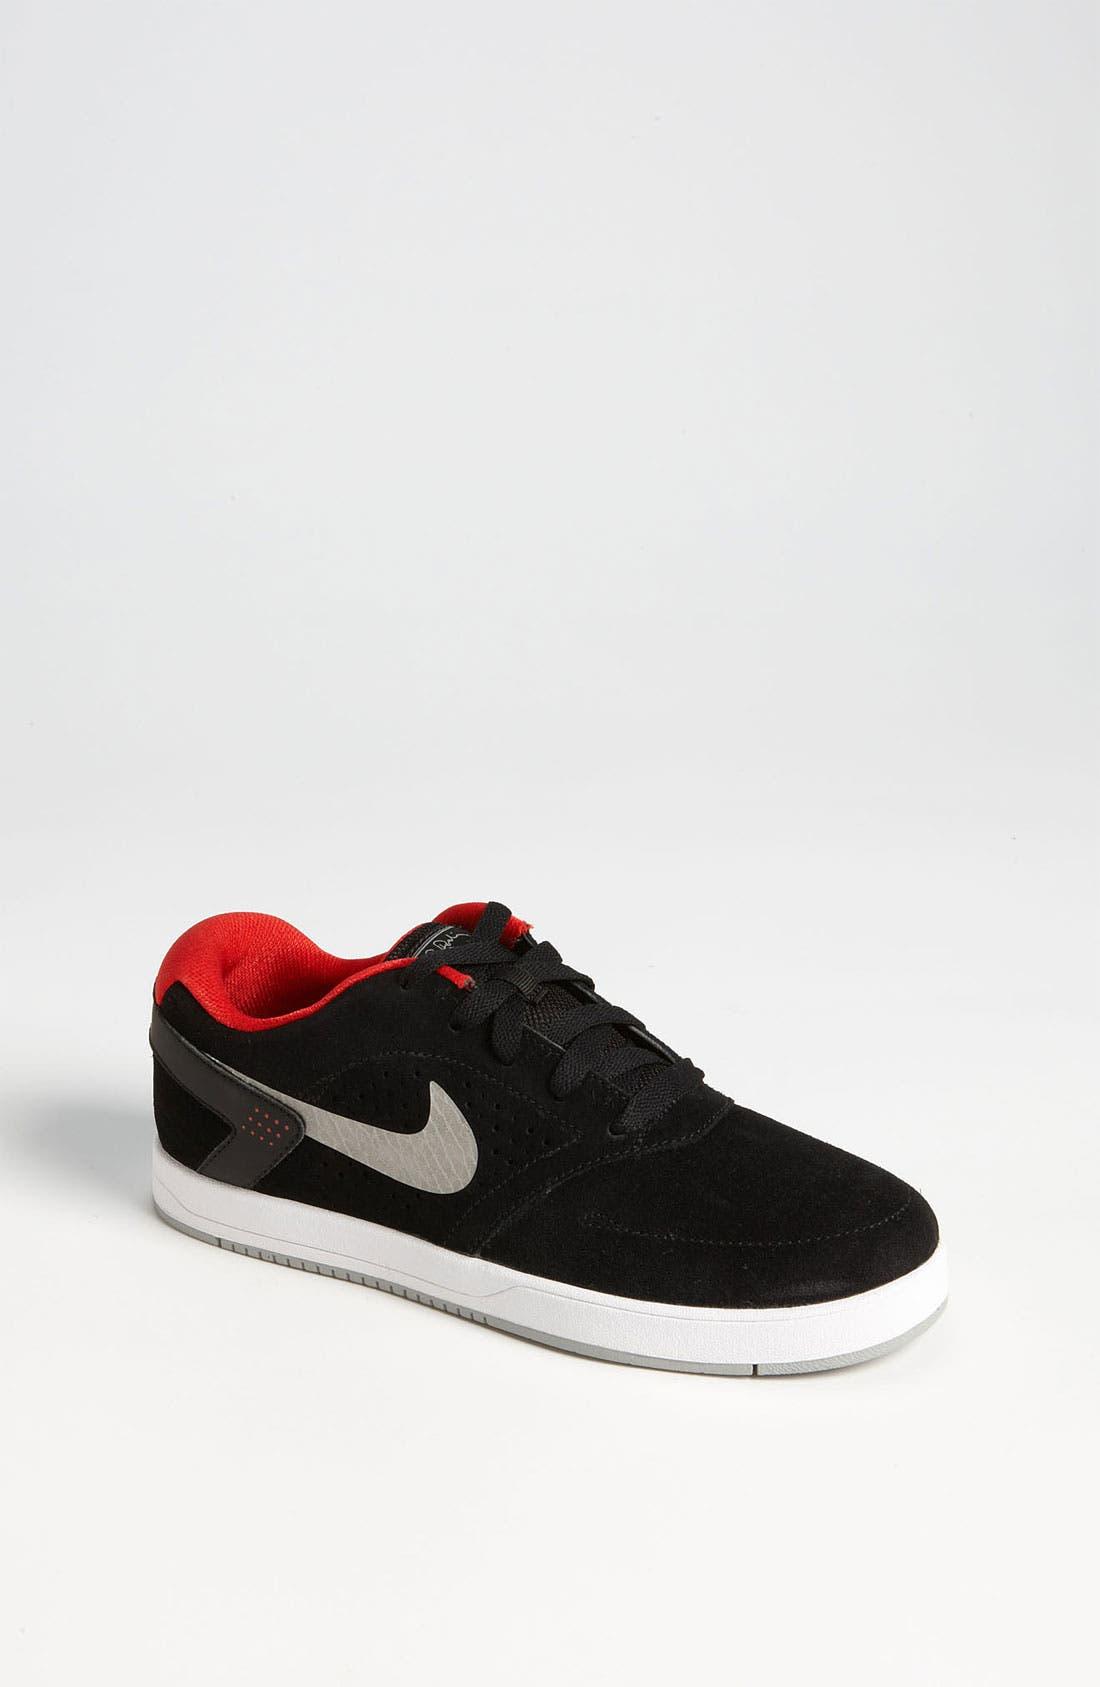 Main Image - Nike 'Paul Rodriguez 6' Sneaker (Toddler, Little Kid & Big Kid)